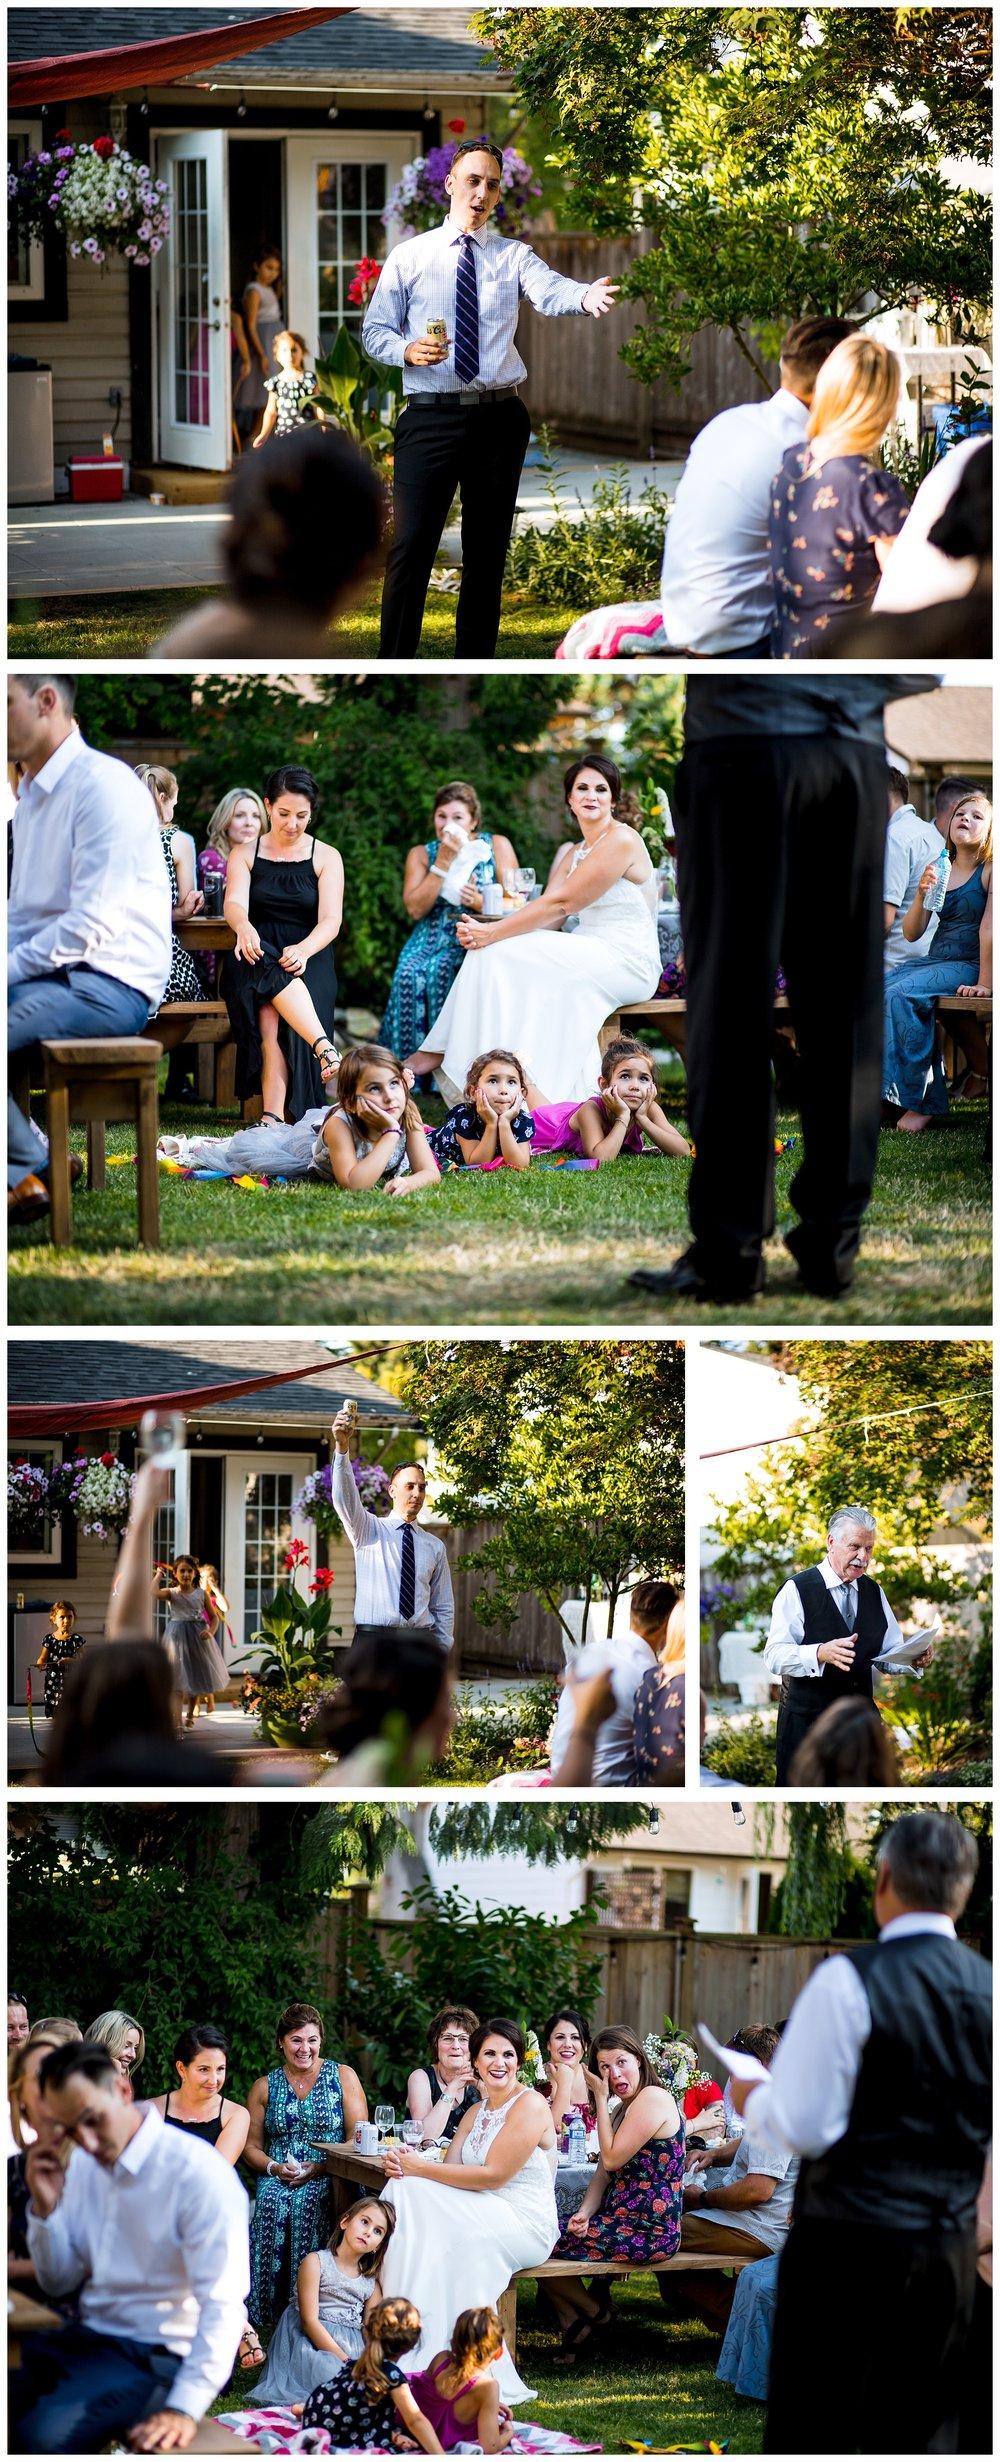 Aldergrove backyard summer wedding photographer bc canada outdoor garden inspiration family couple with kids, bride and groom_0076.jpg